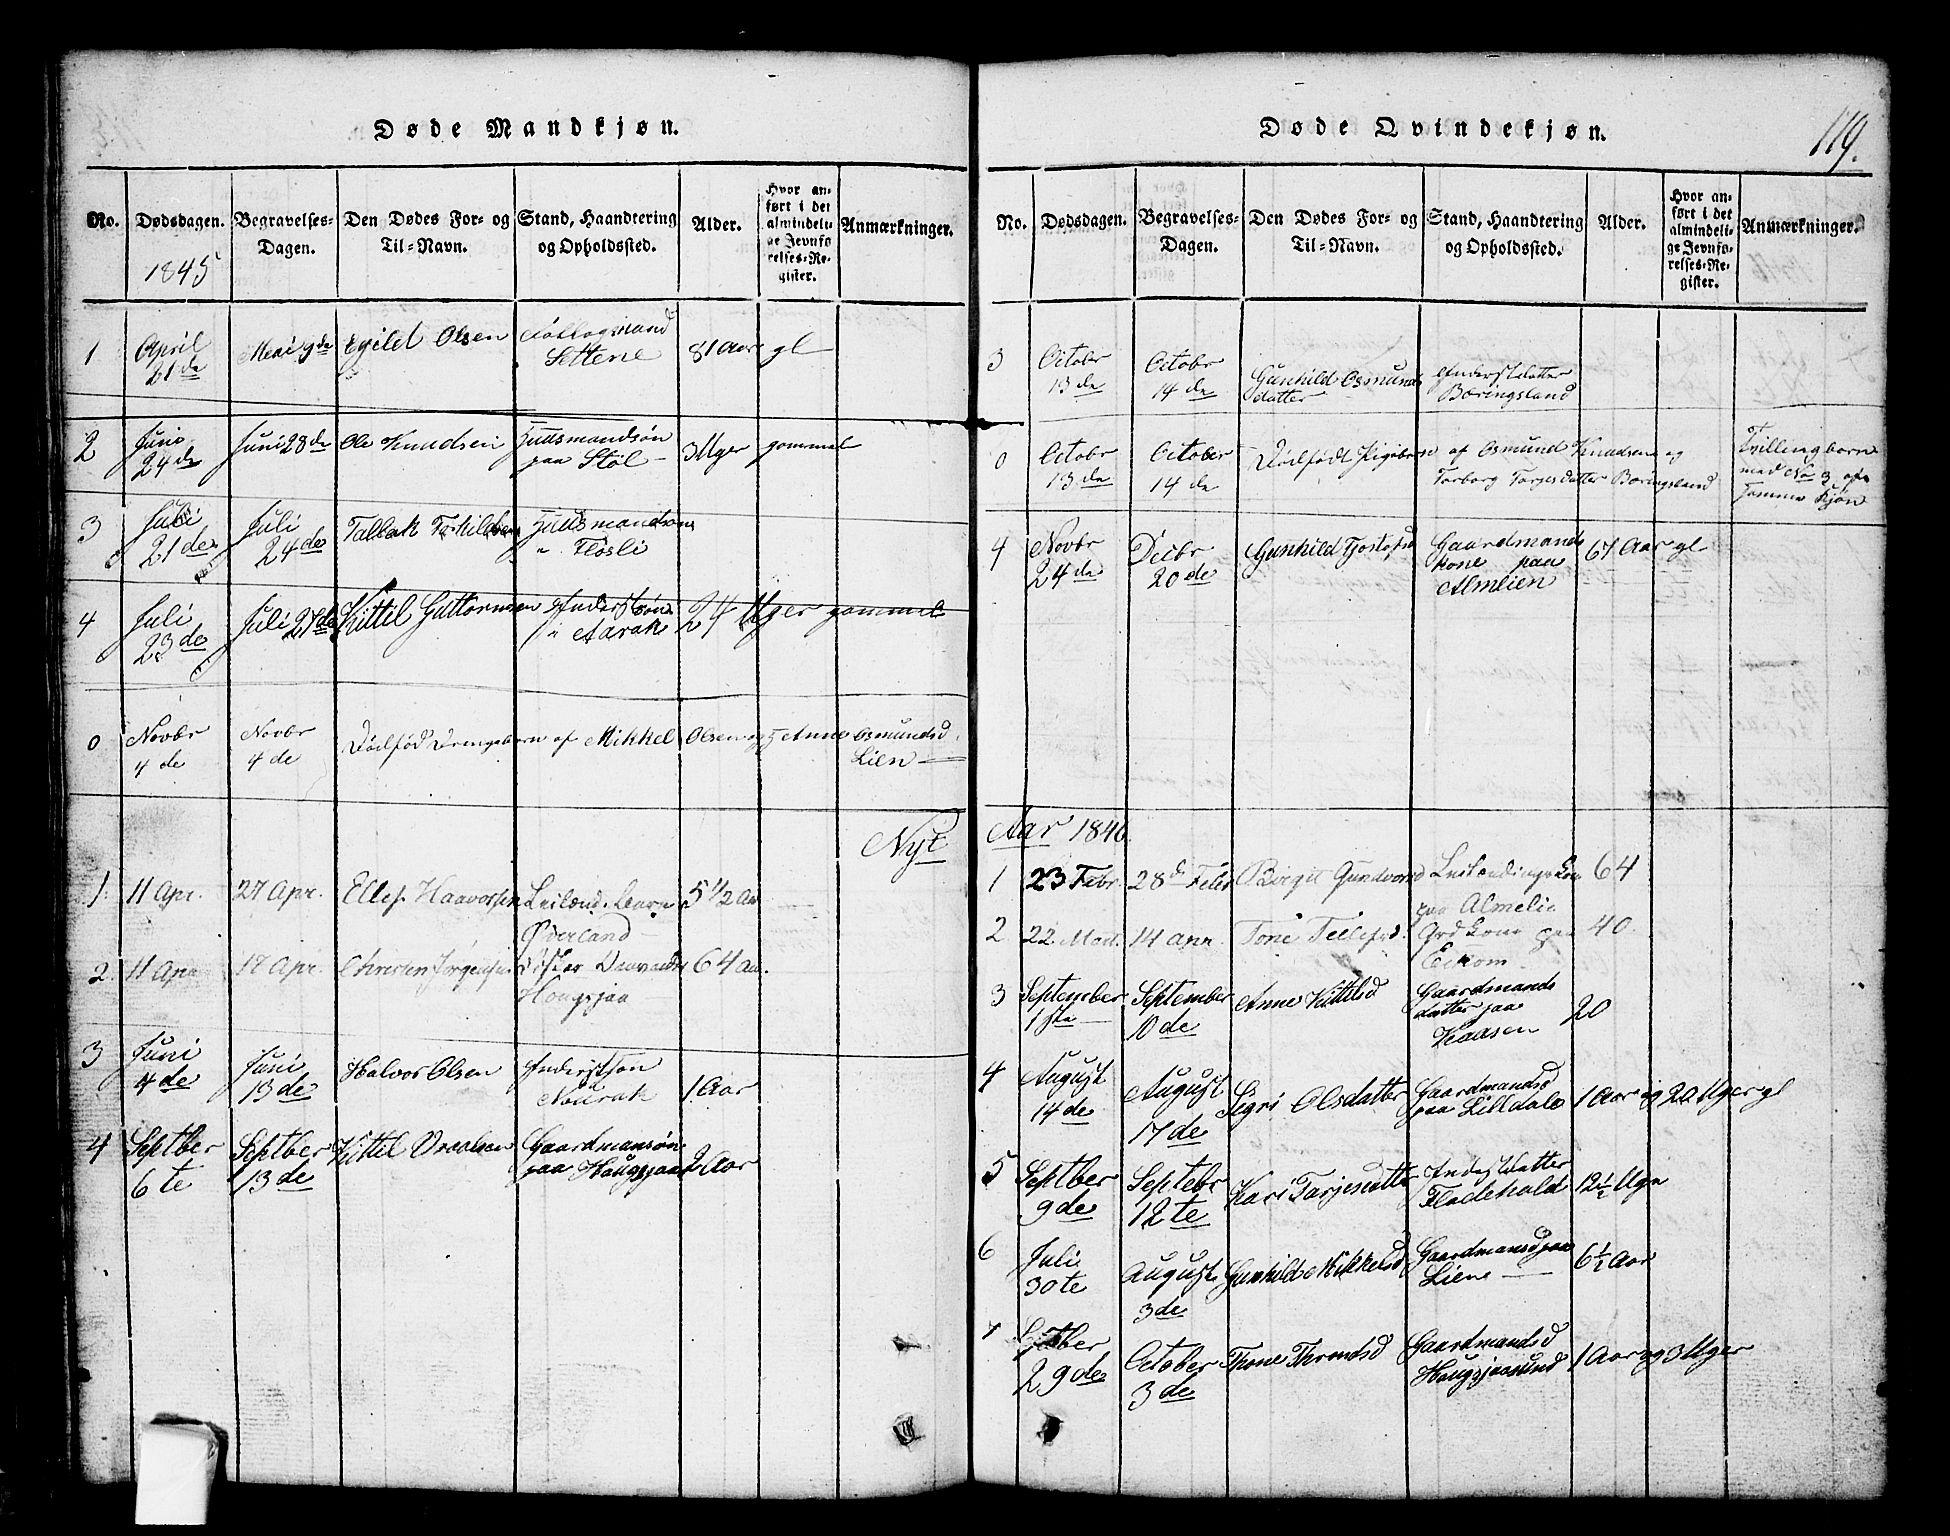 SAKO, Nissedal kirkebøker, G/Gb/L0001: Klokkerbok nr. II 1, 1814-1862, s. 119